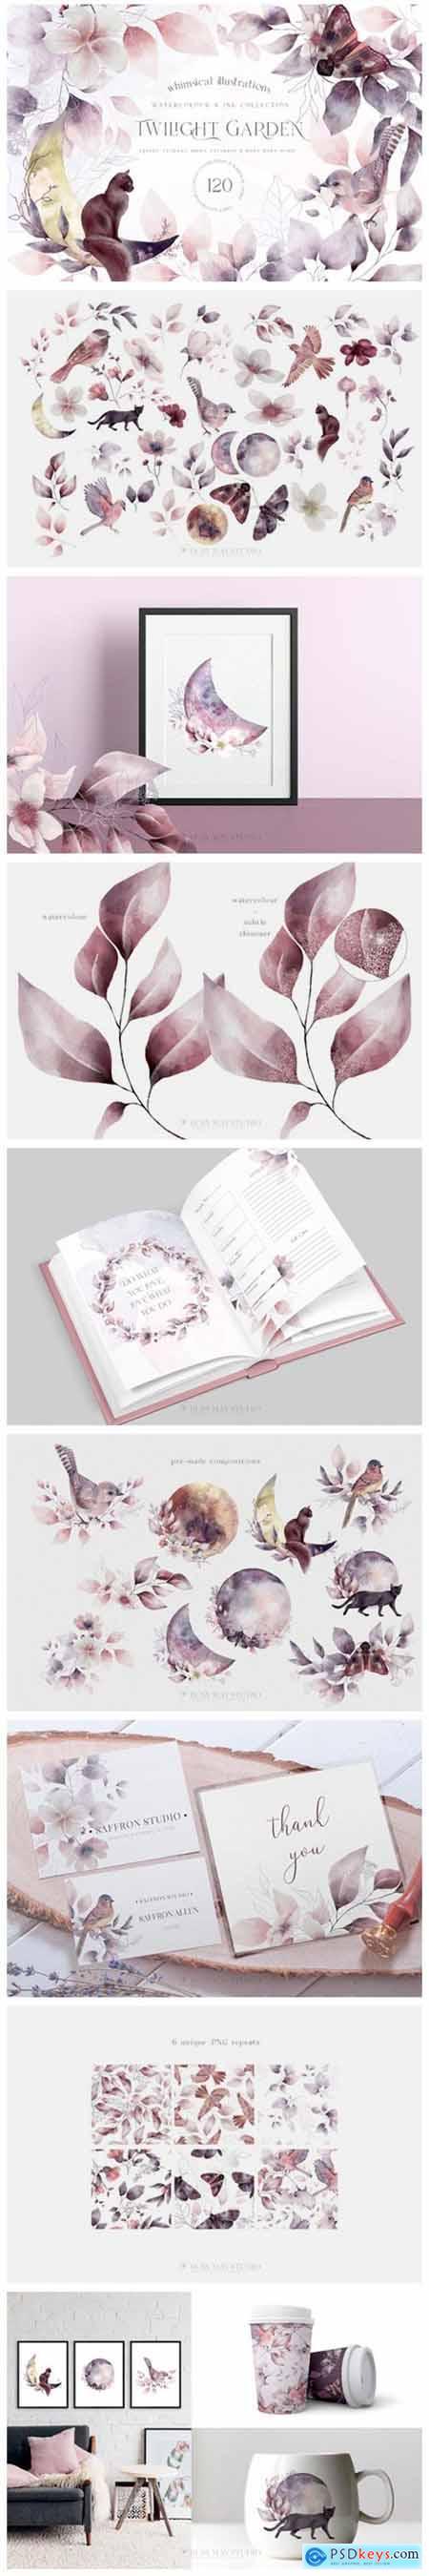 Whimsical Leaves Flowers Birds Moons 10043519